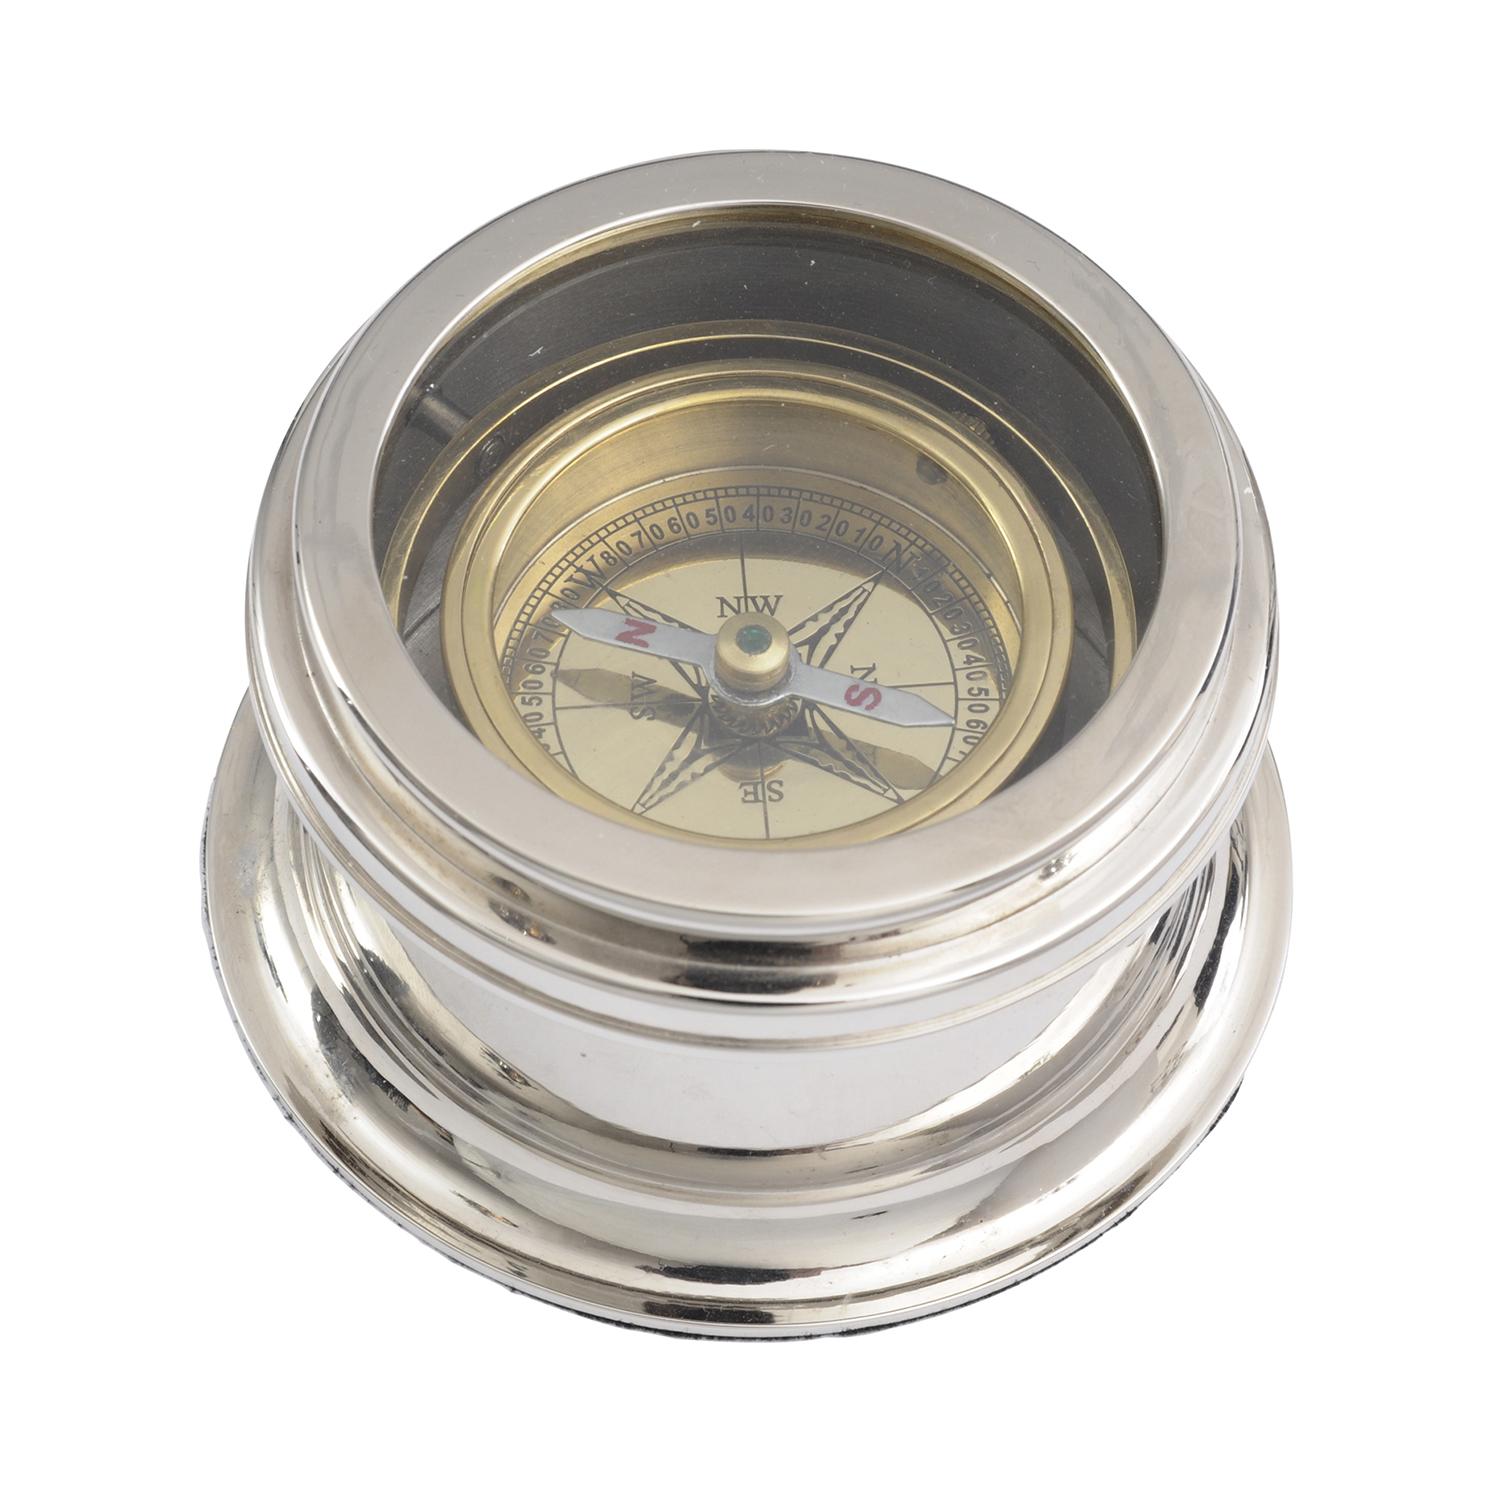 Libra – Brass and Nickel Compass